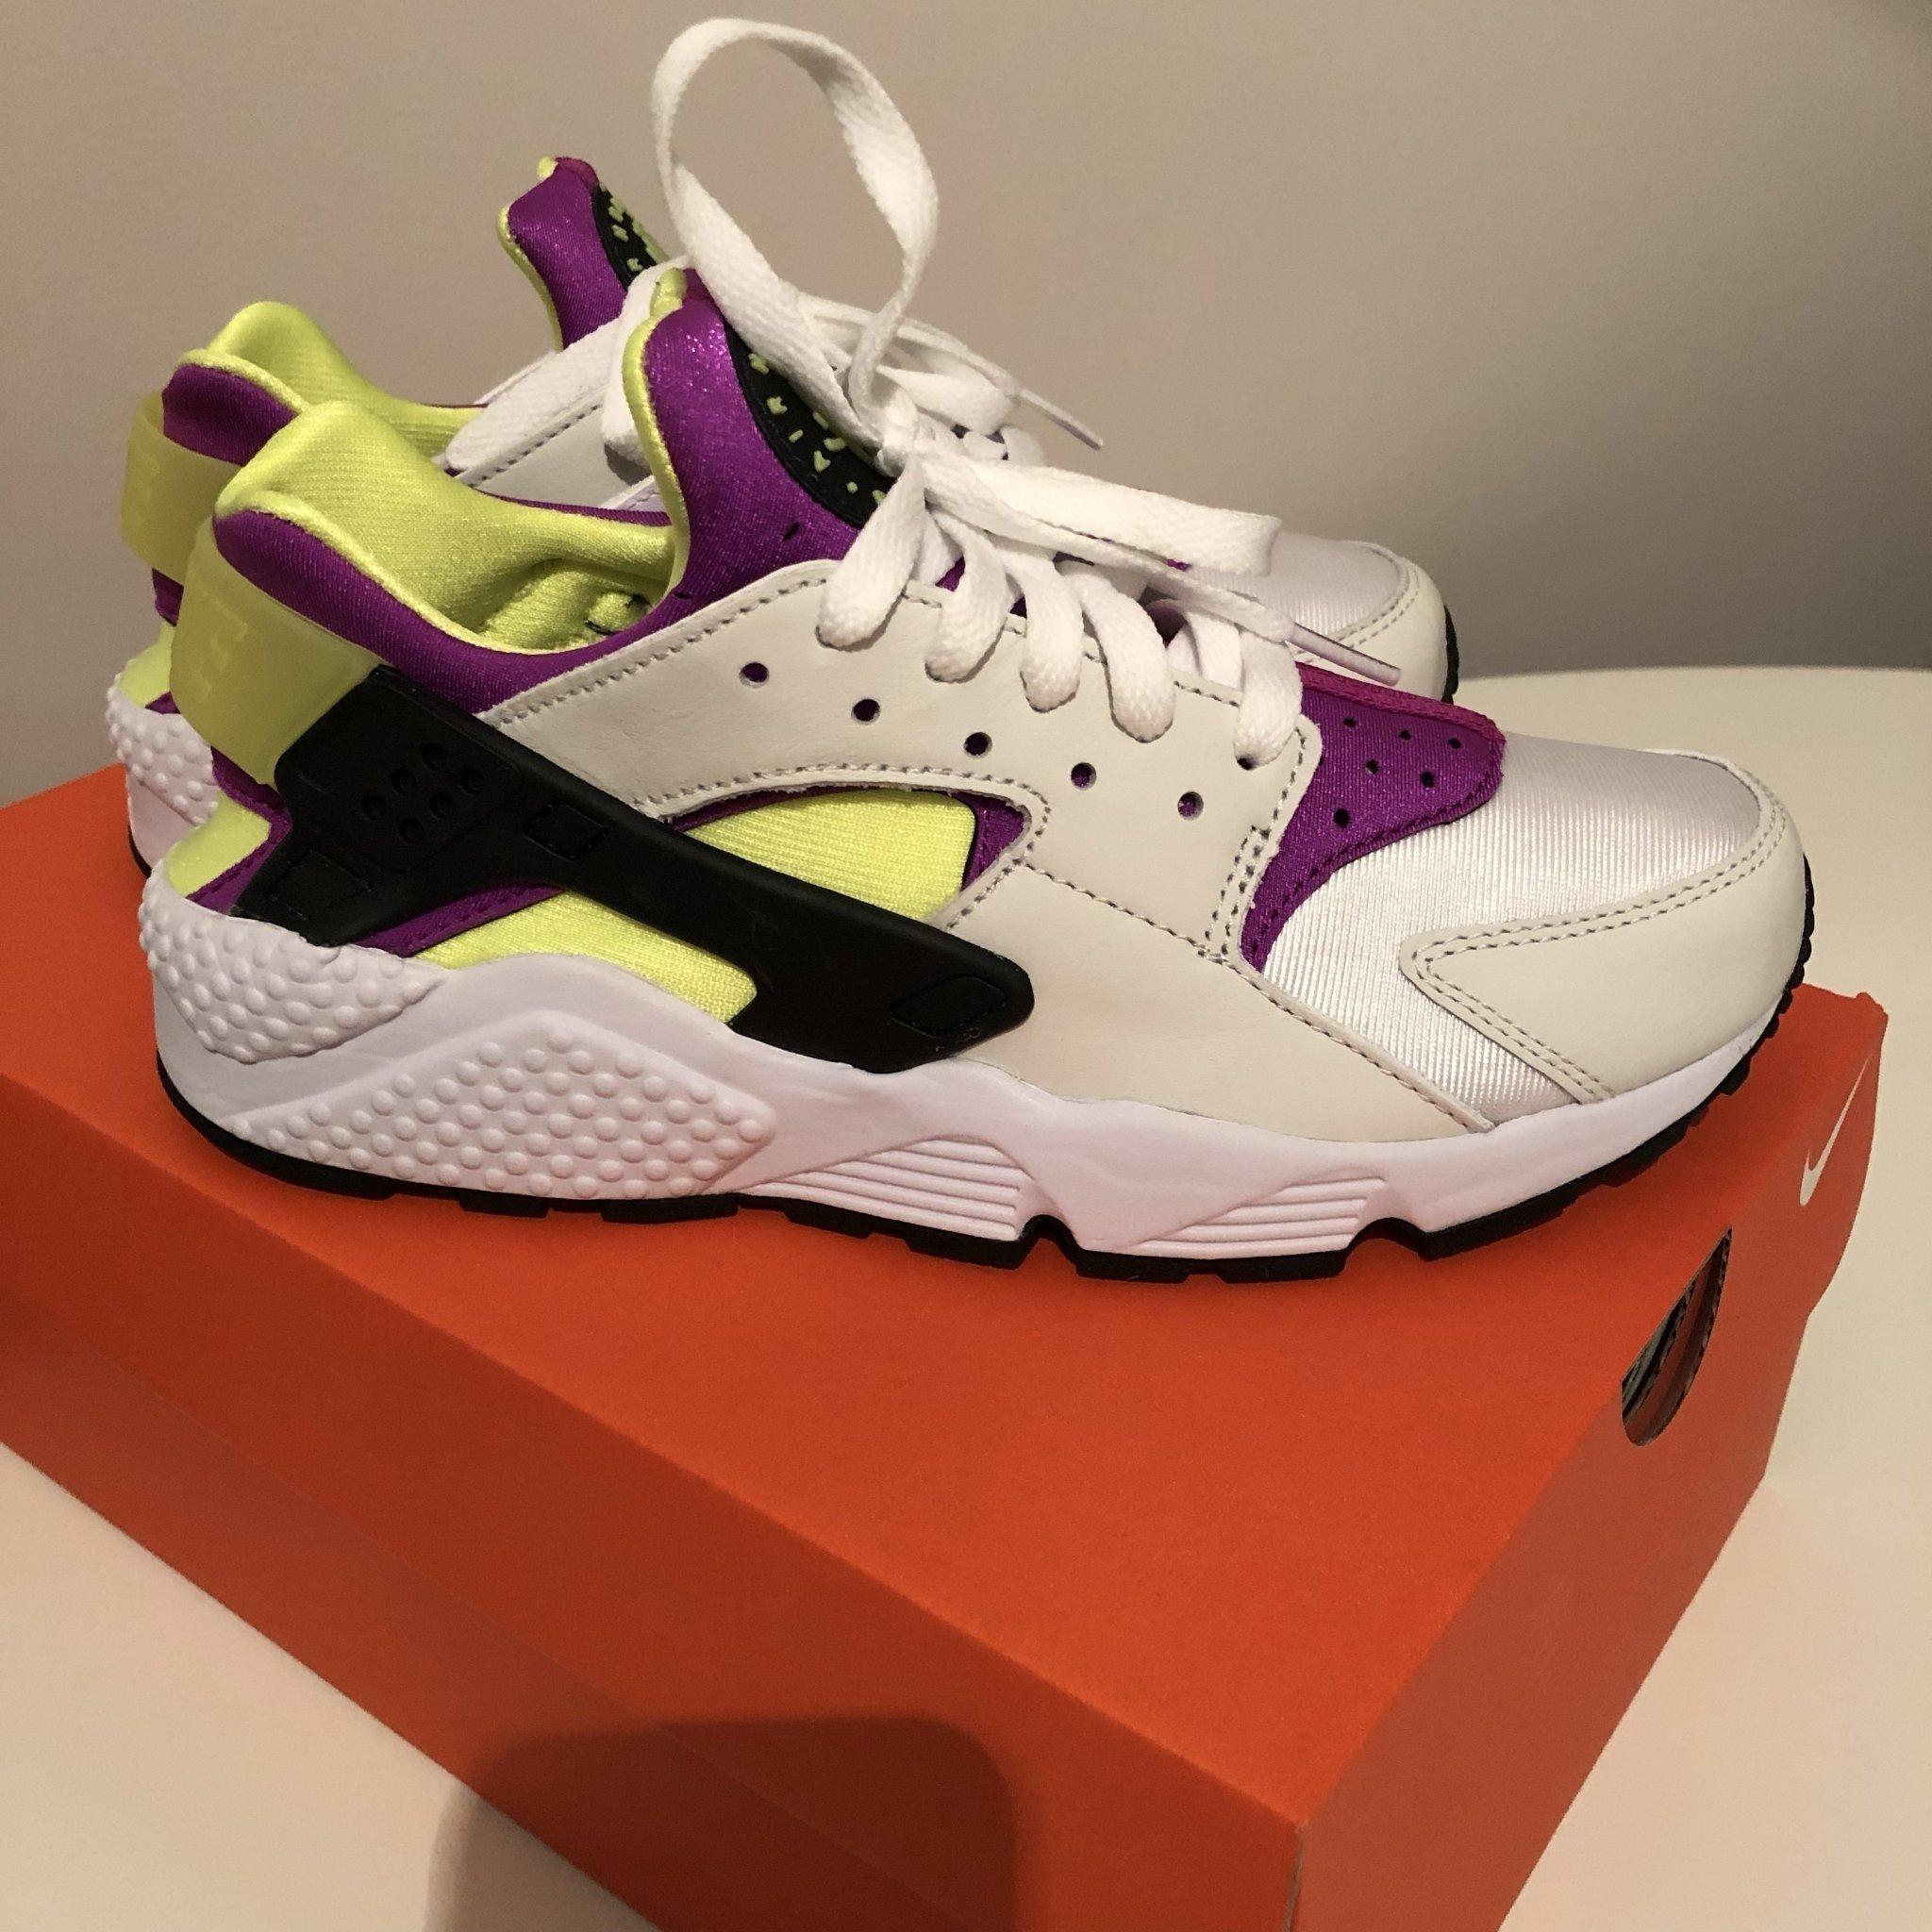 low priced cc694 e03fb Nike Huarache 38,5 Nya i kartong! (347827938) ᐈ Köp på Tradera